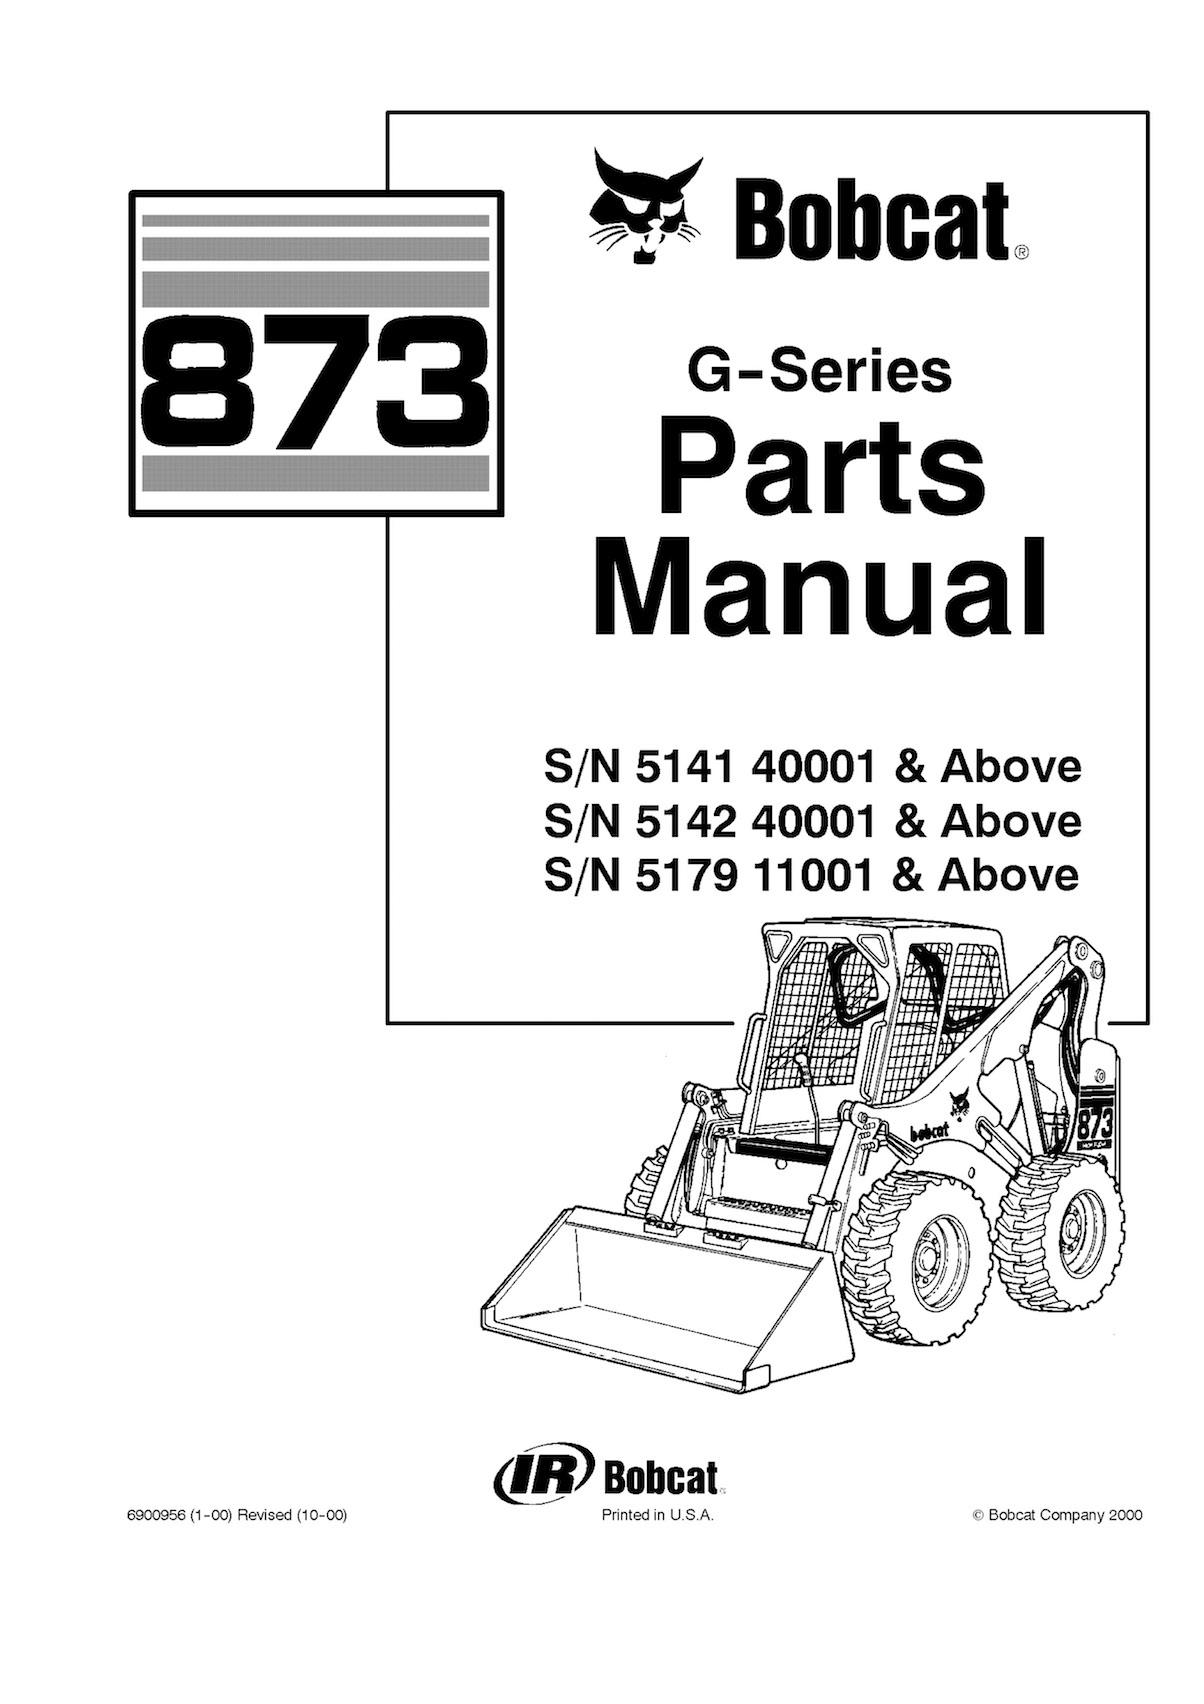 hight resolution of bobcat 873 f series parts diagram wiring diagram third levelbobcat 873 f series parts diagram wiring